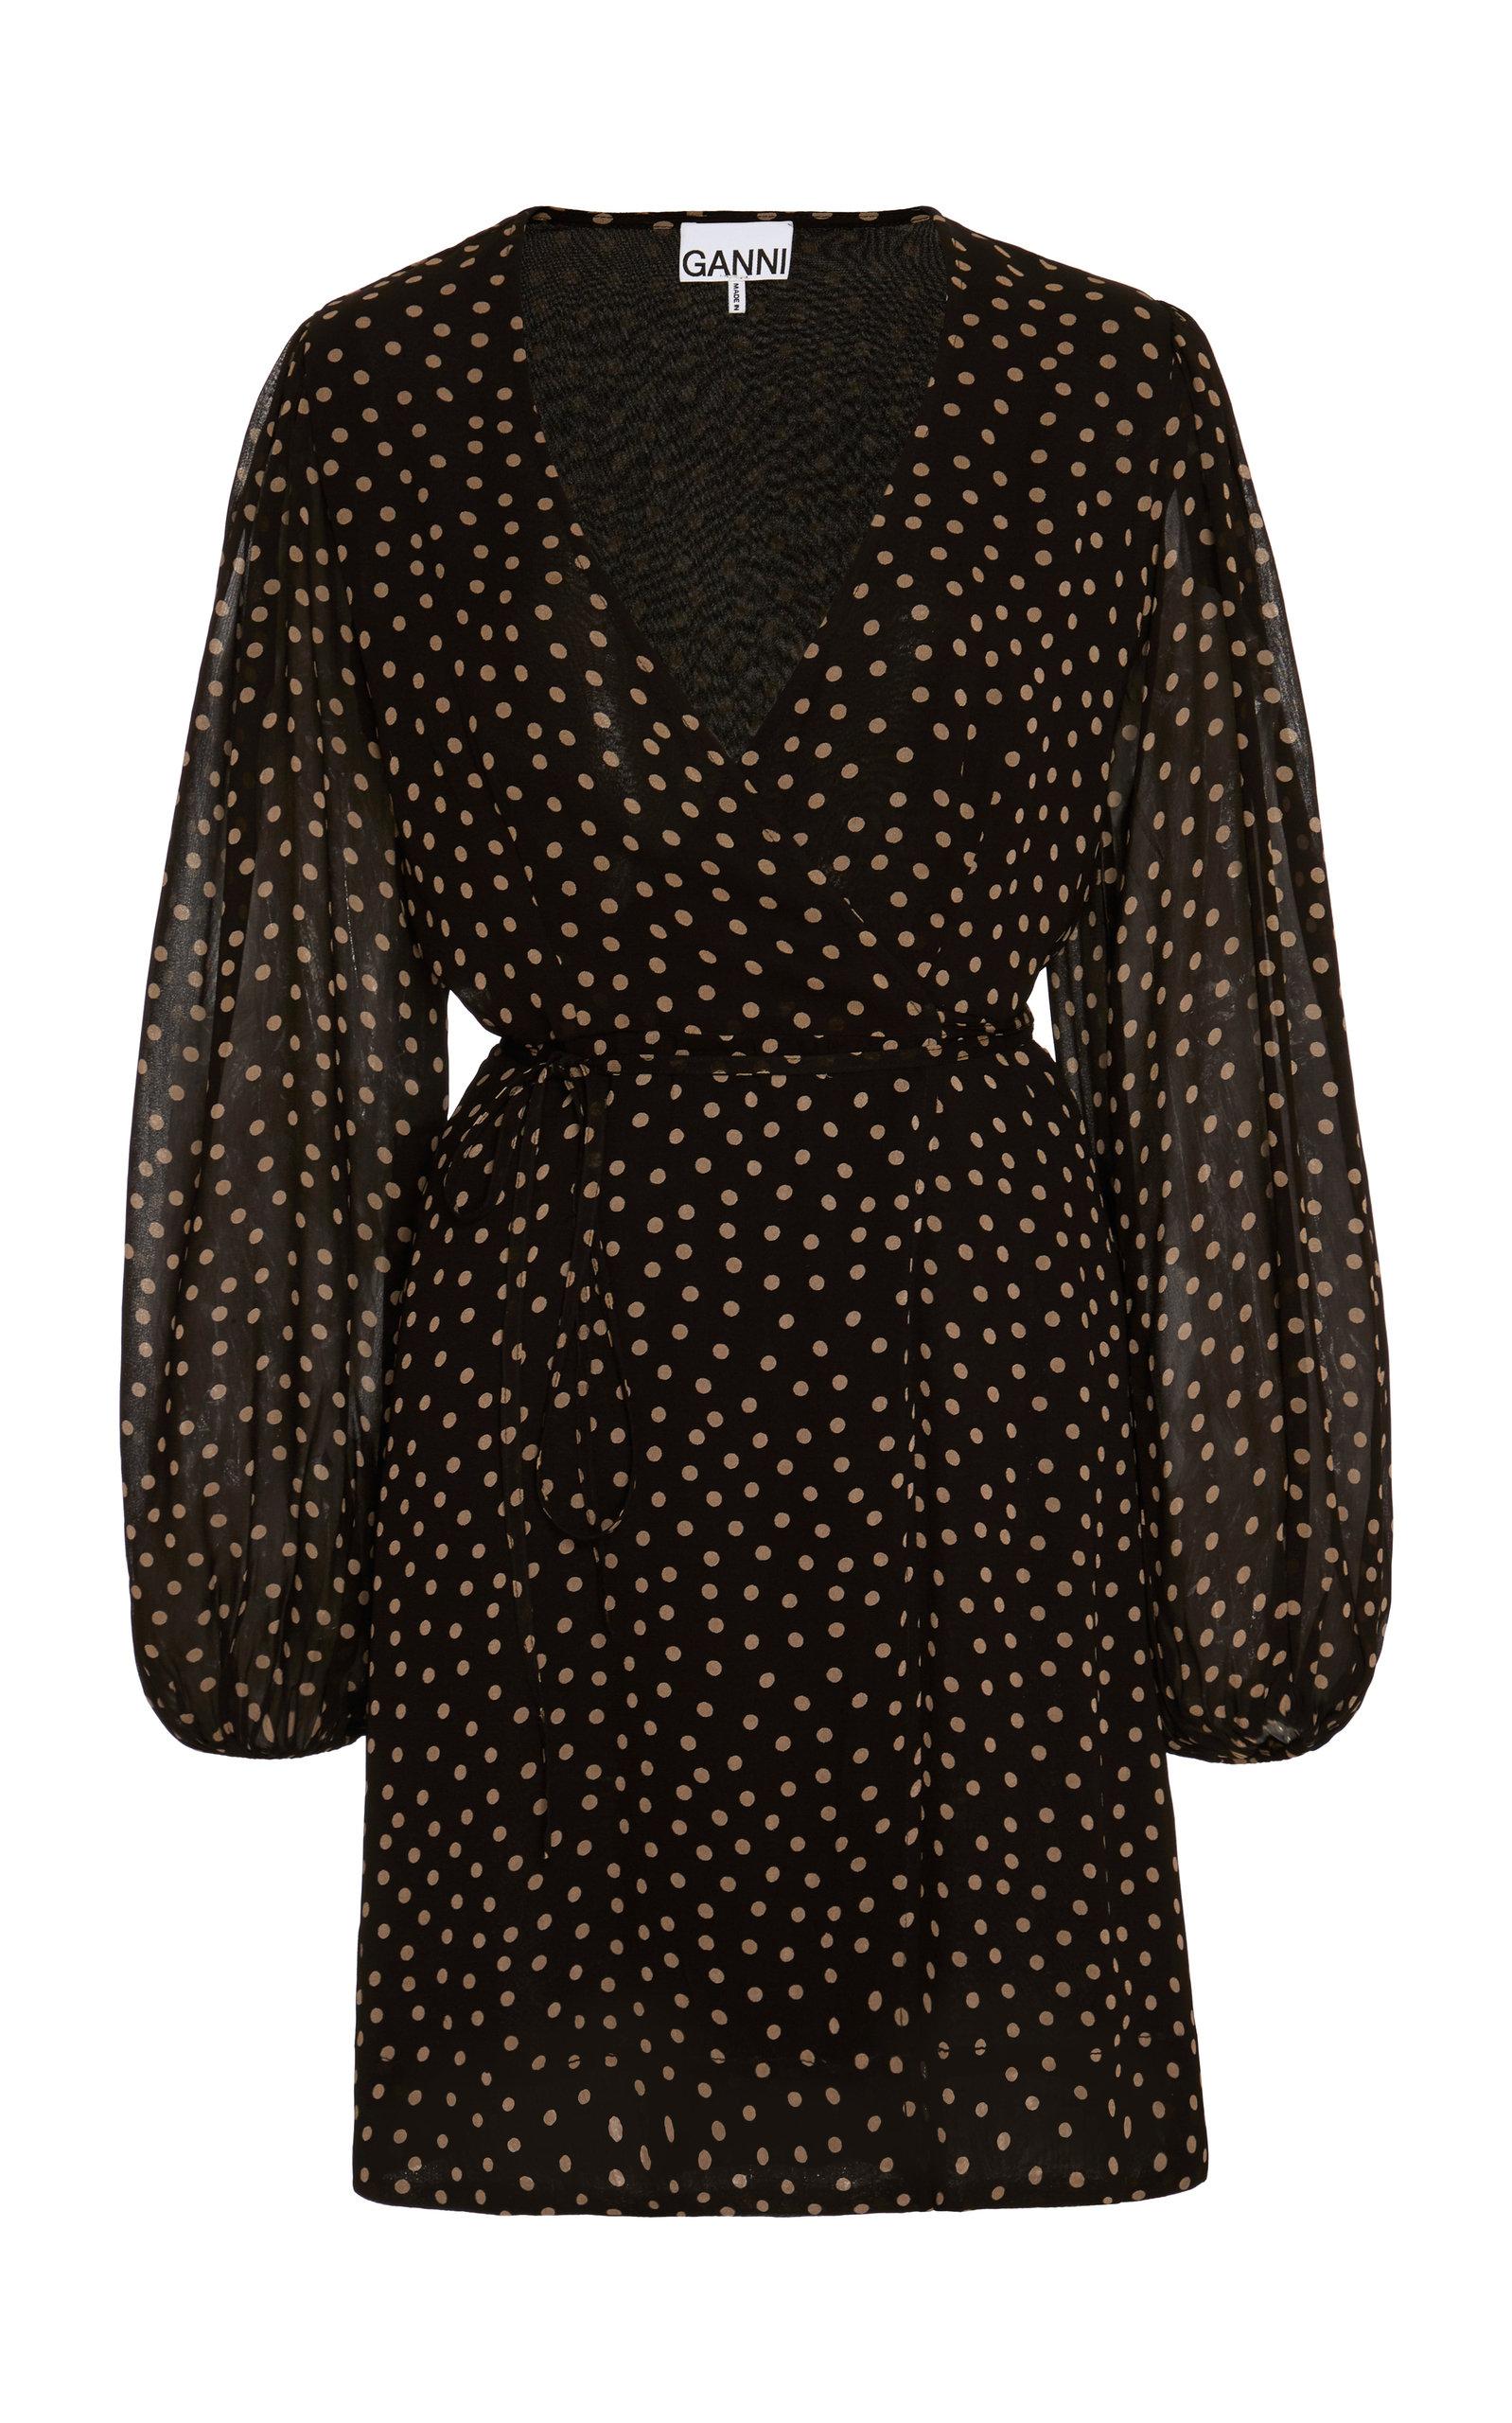 Buy Ganni Polka-Dot Georgette Mini Wrap Dress online, shop Ganni at the best price